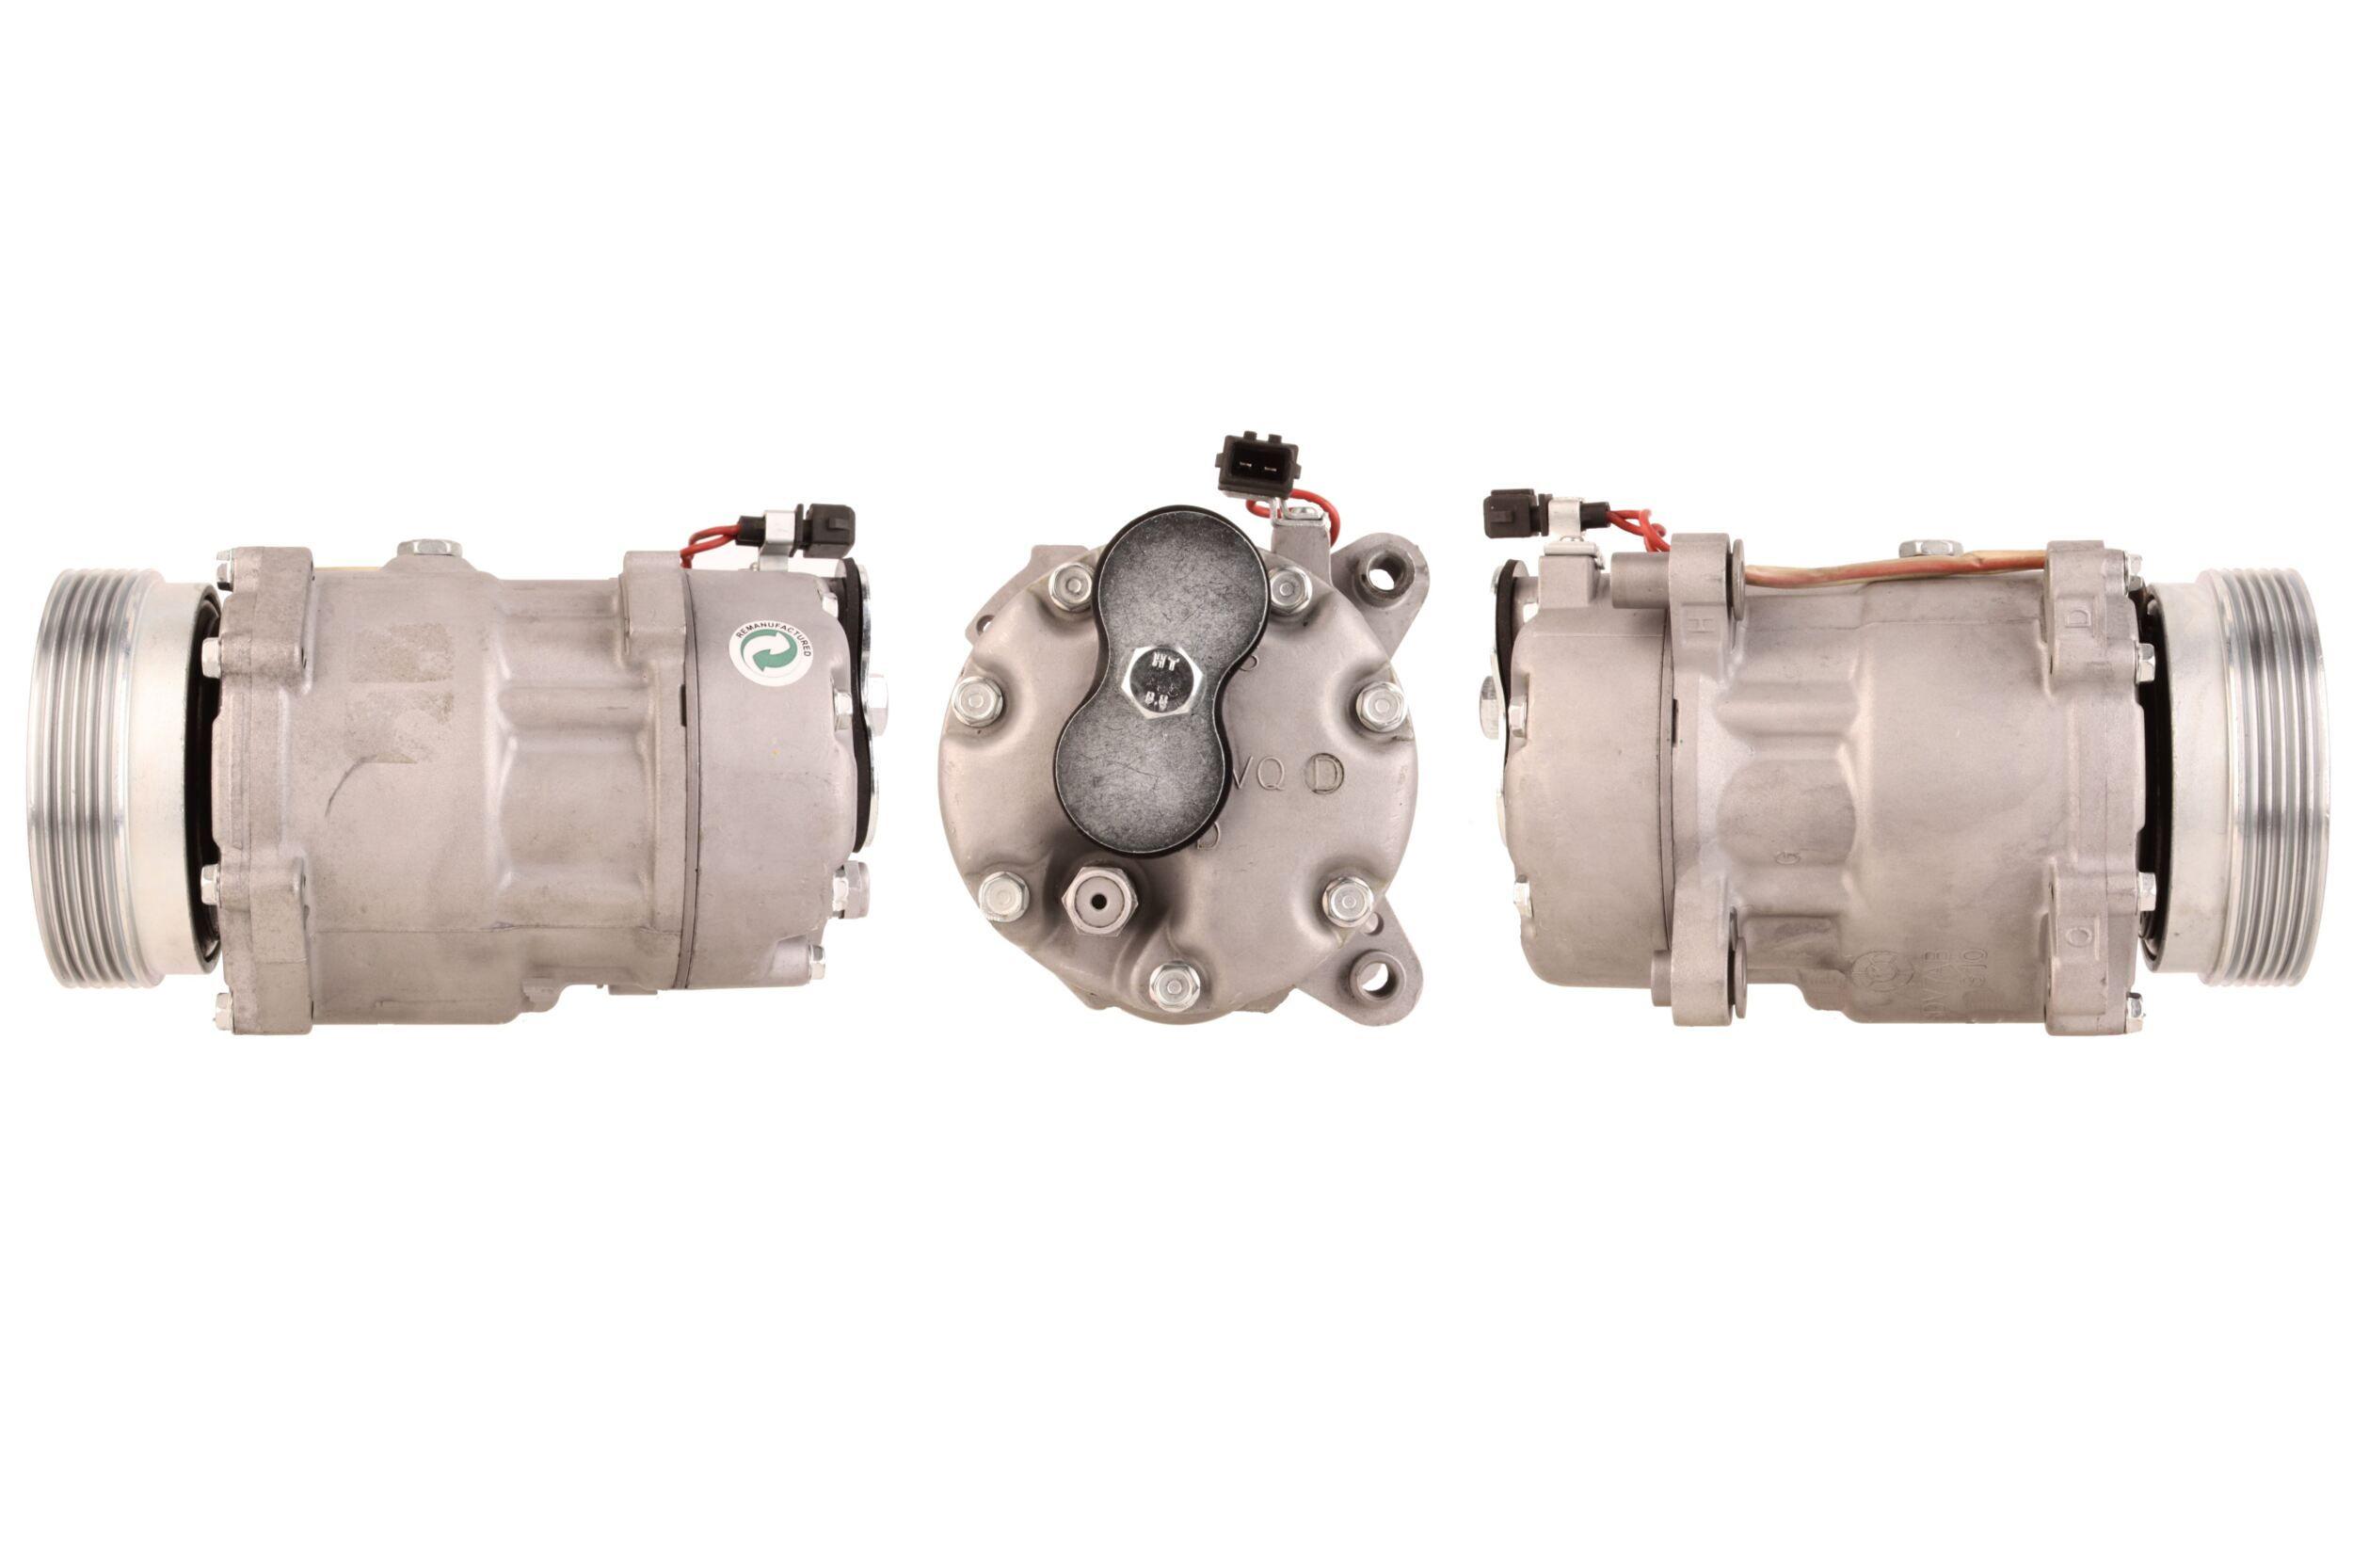 Original AUDI Kompressor Klimaanlage 51-0003